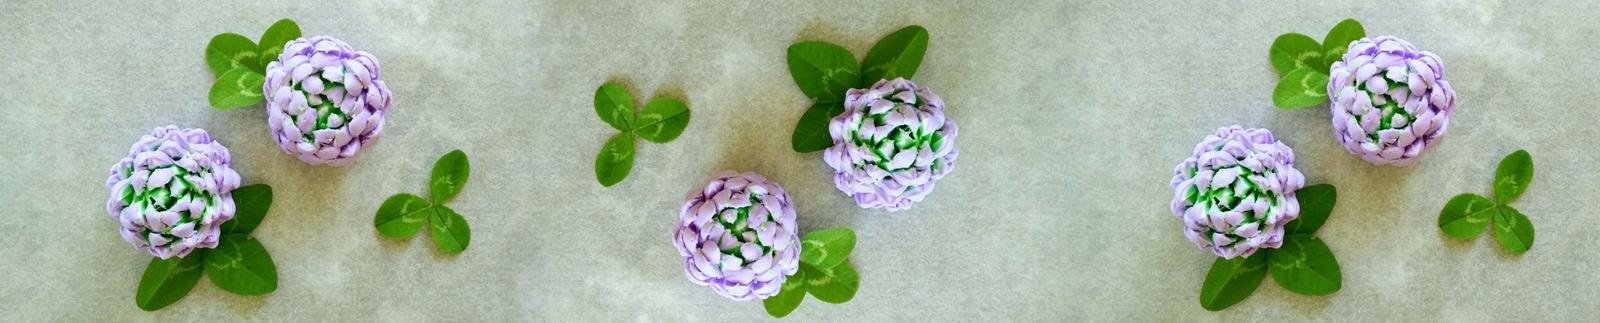 Zala_Zagoricnik_DIY_FIMO_Polimer_clay_clover_flower_11